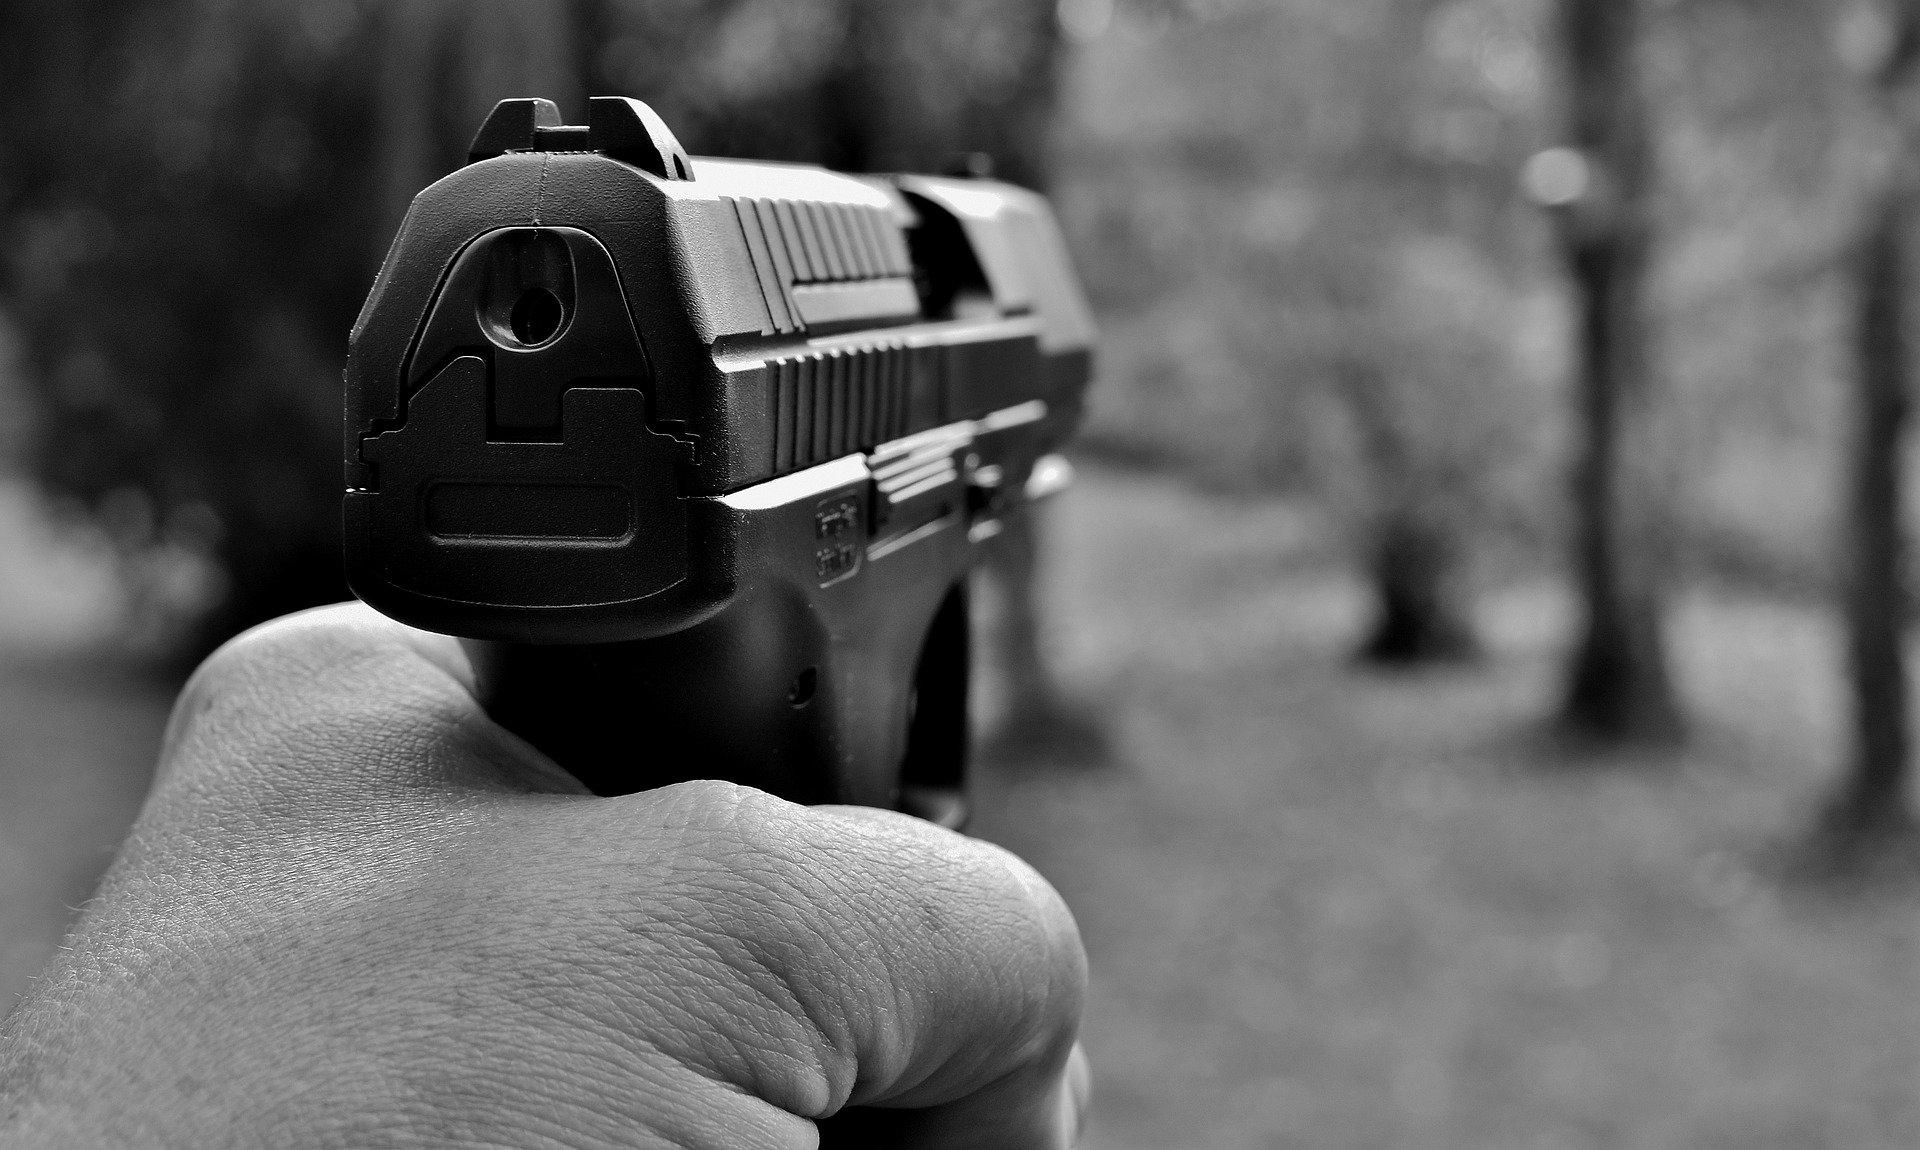 Aantal slachtoffers moord en doodslag vorig jaar toegenomen